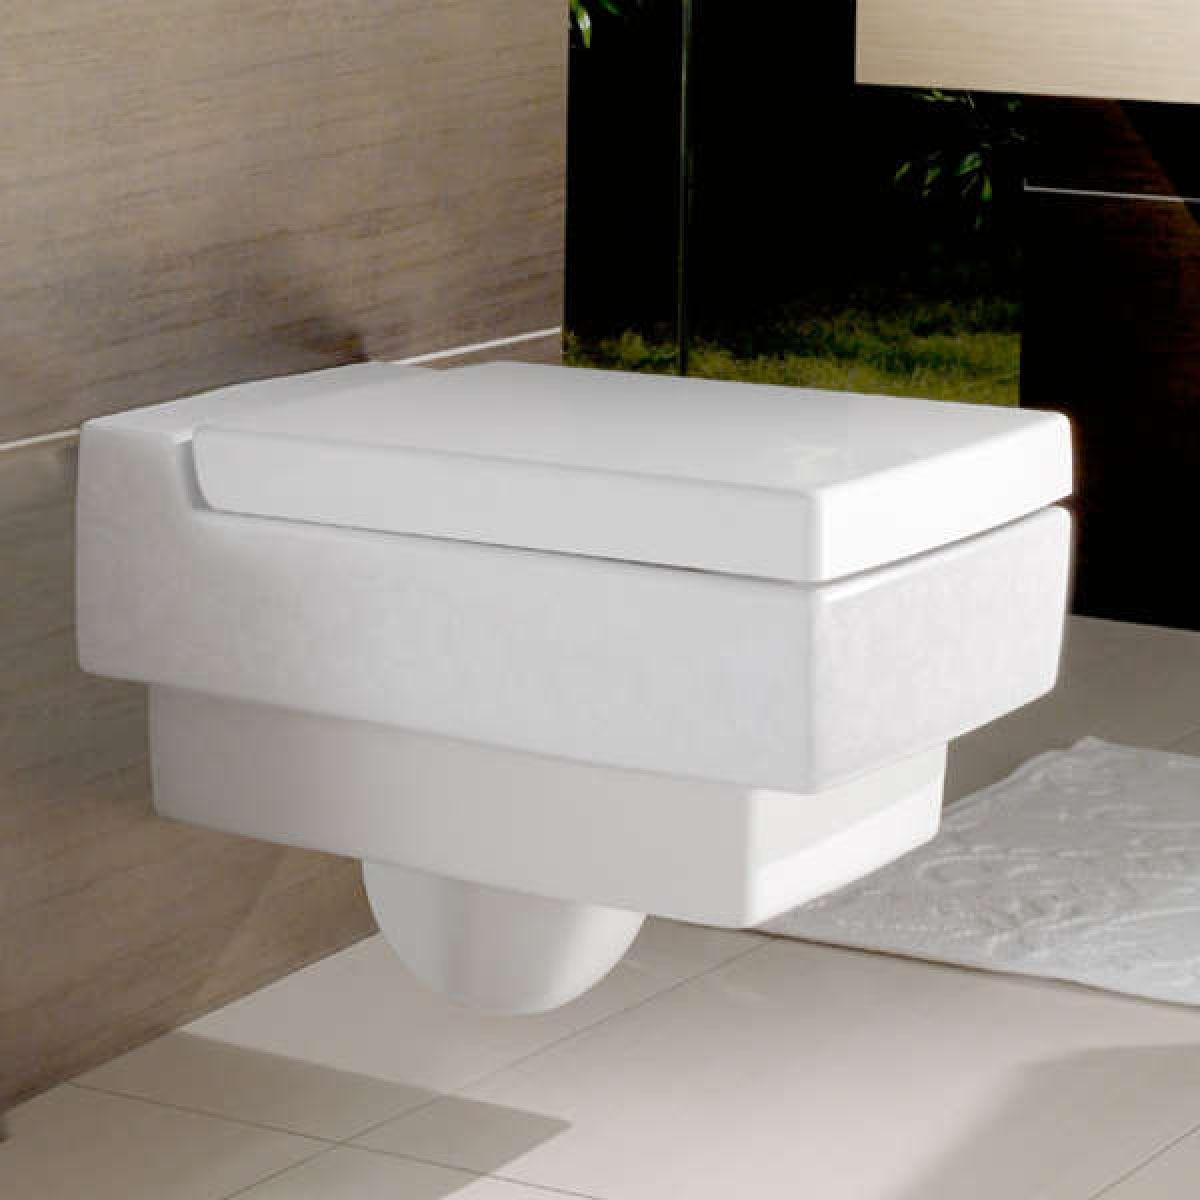 Villeroy & Boch Memento Wall Hung Toilet